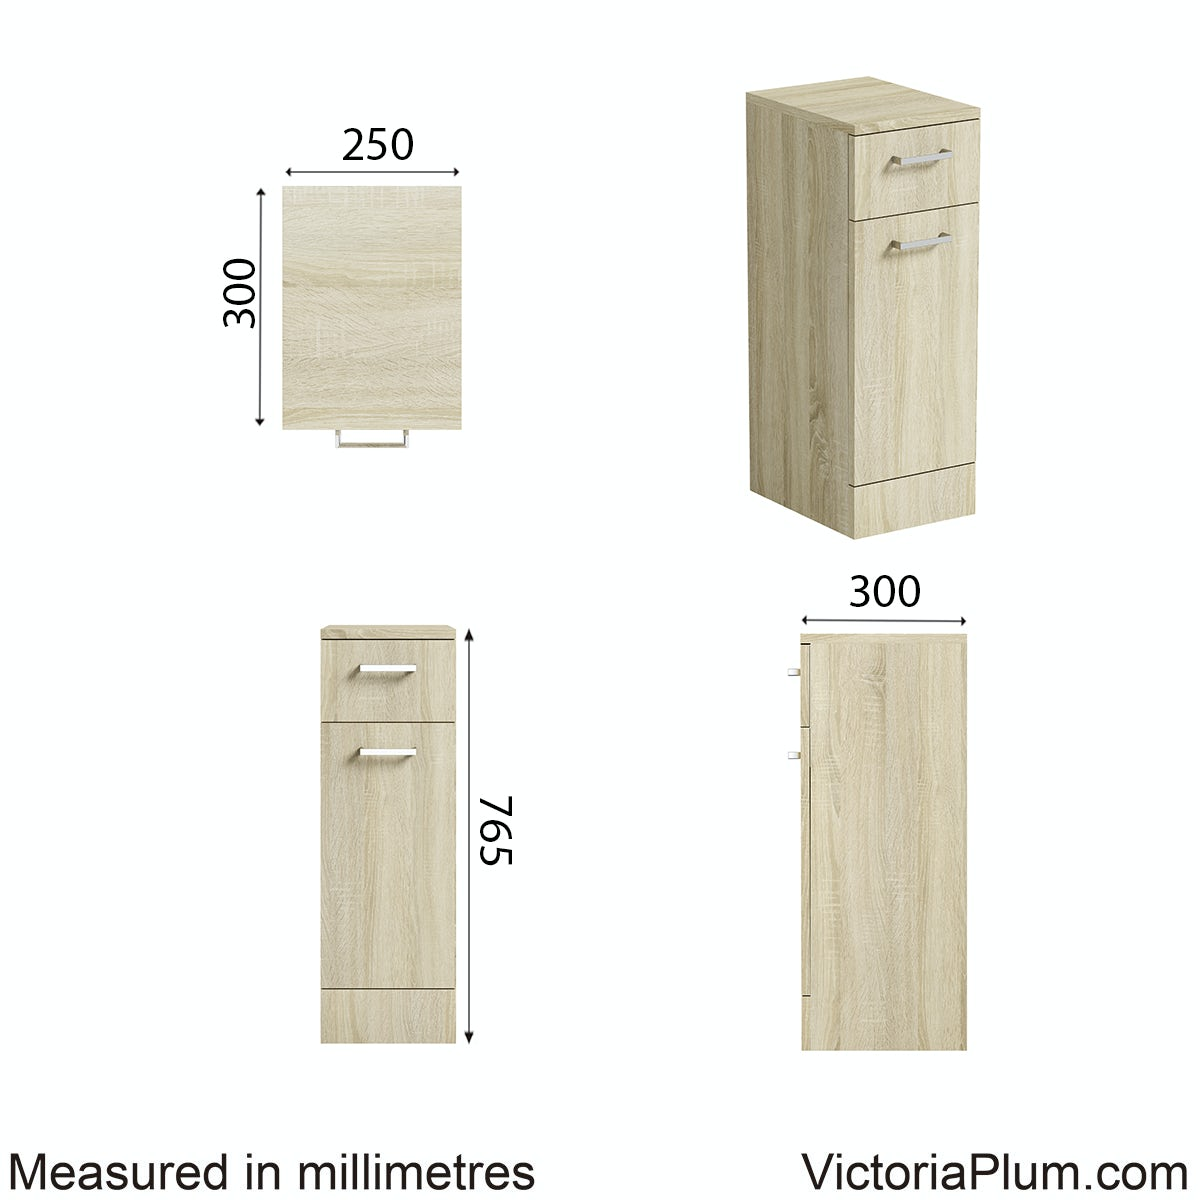 Dimensions for Orchard Eden oak linen basket unit 300mm